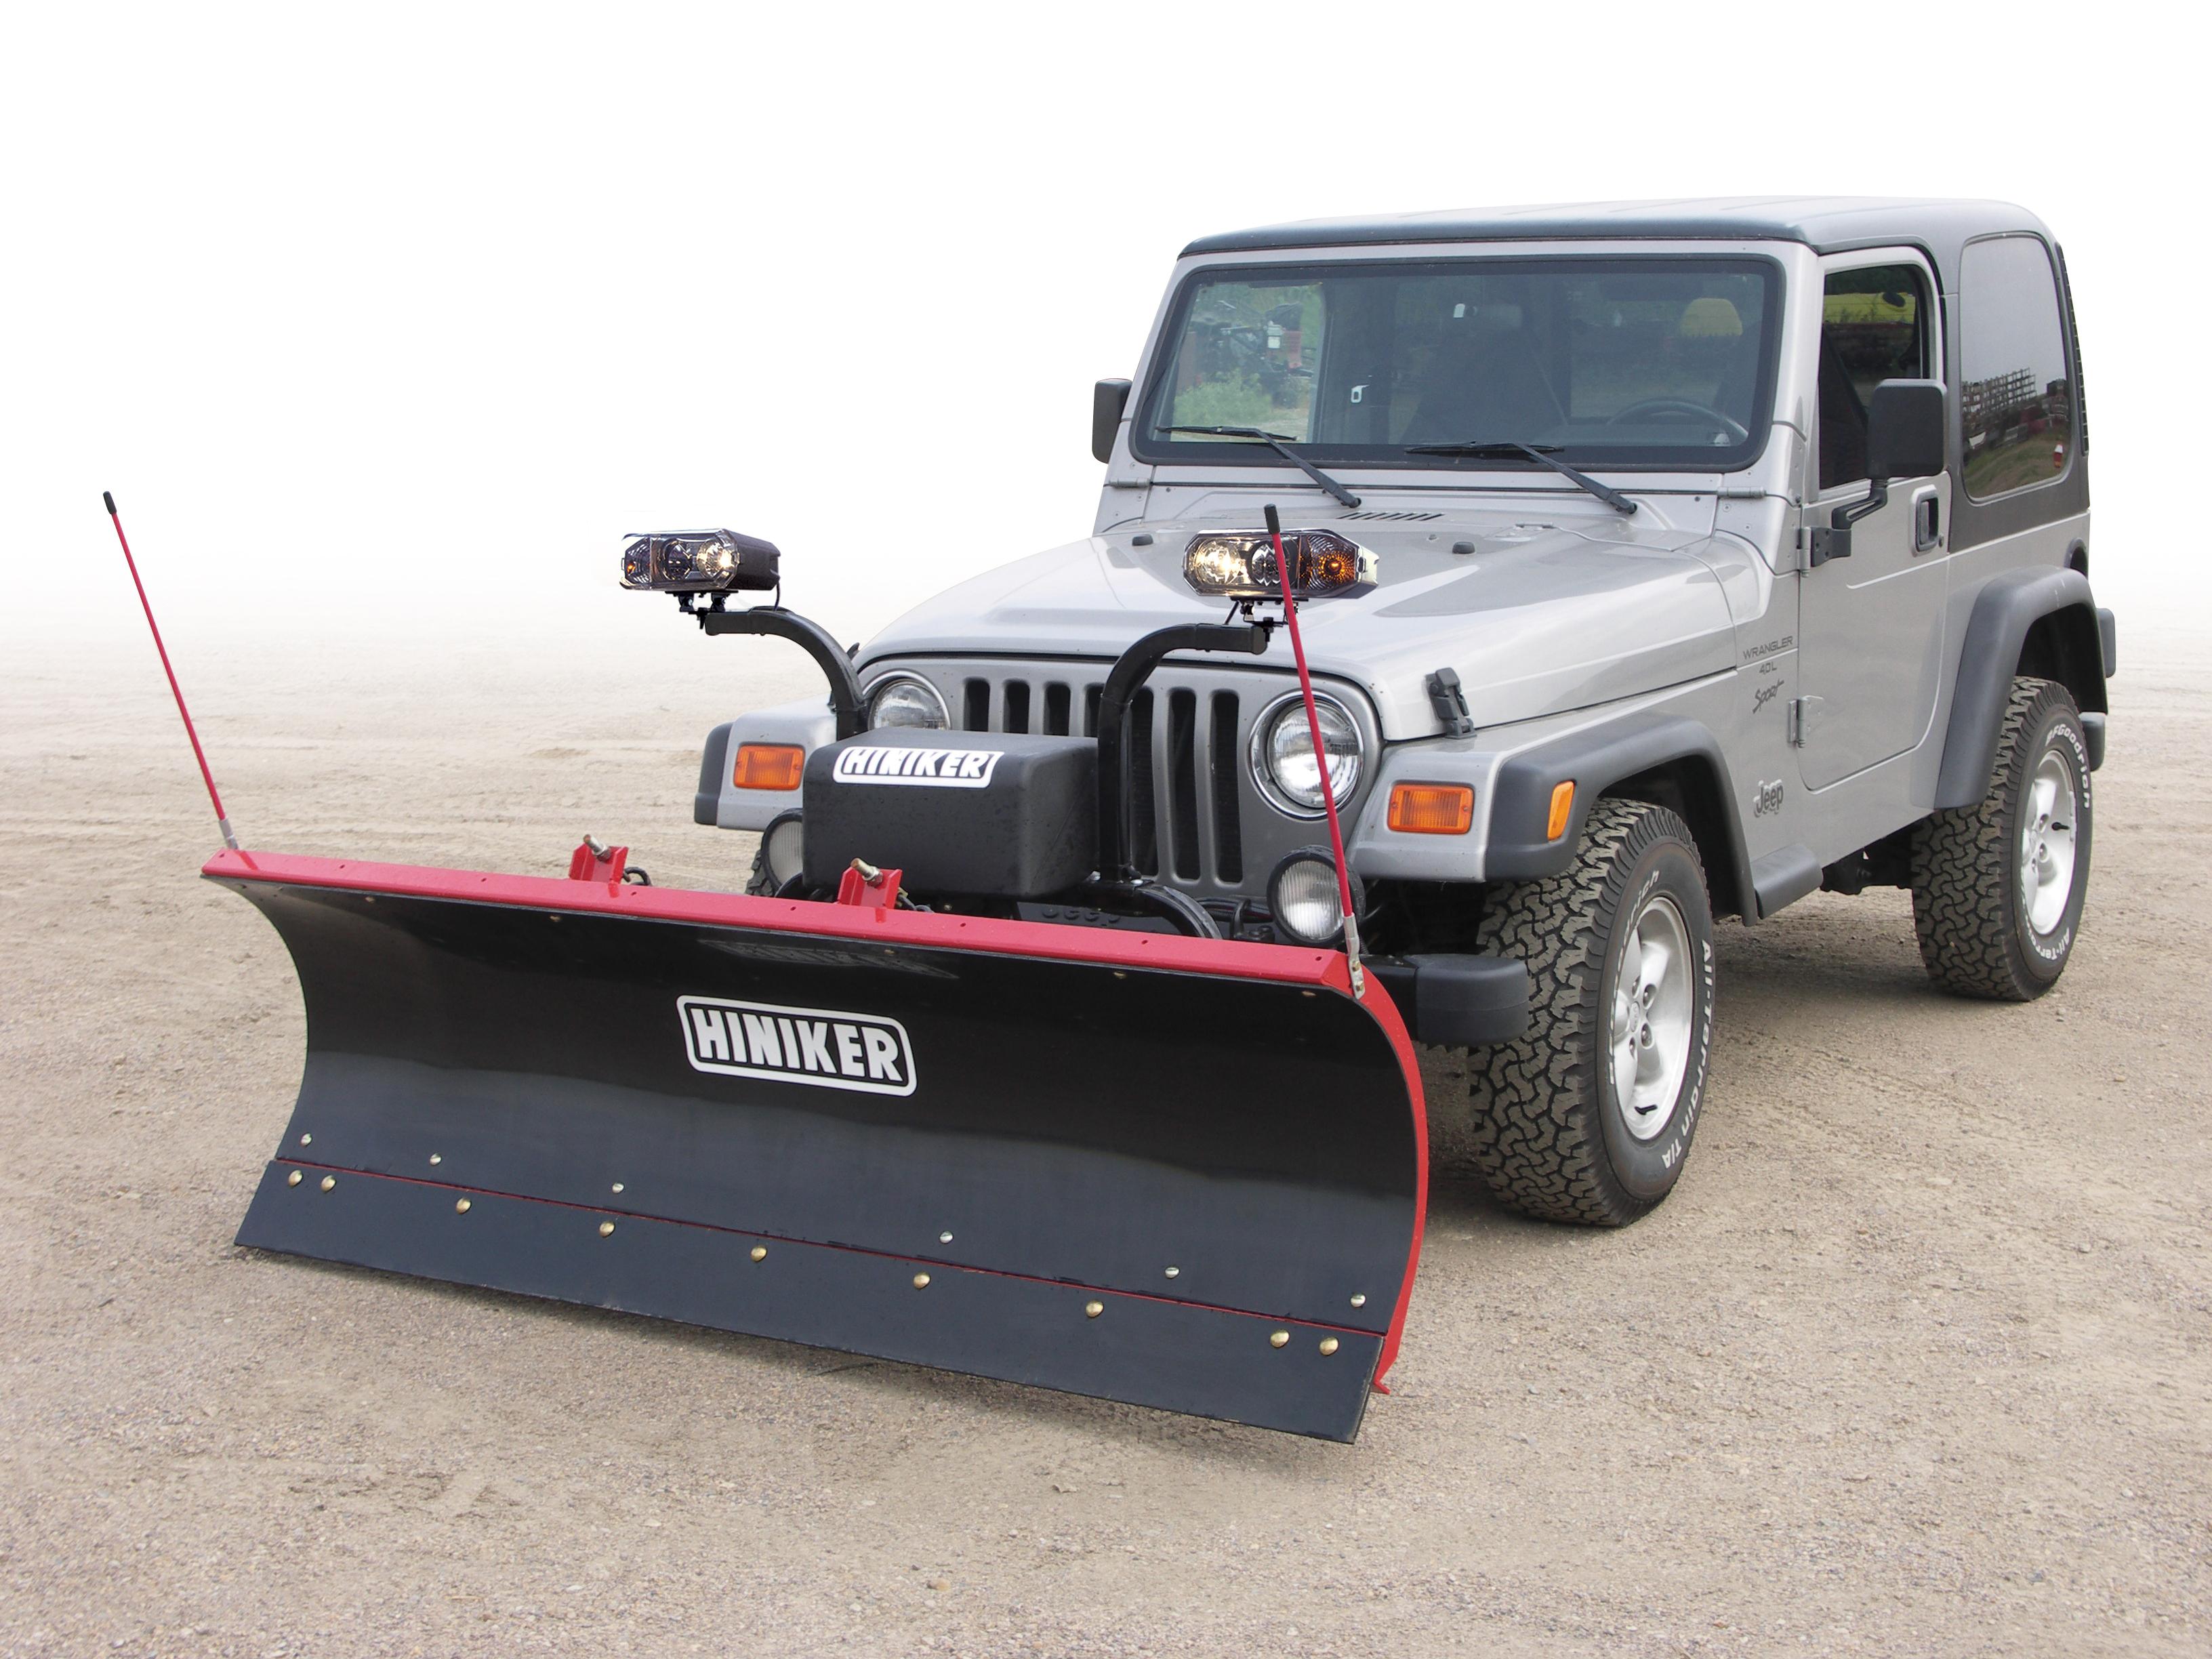 New Hiniker 752 Model, Mid-Size, Full Trip Edge, Halogen headlights Poly Straight Blade, QH1